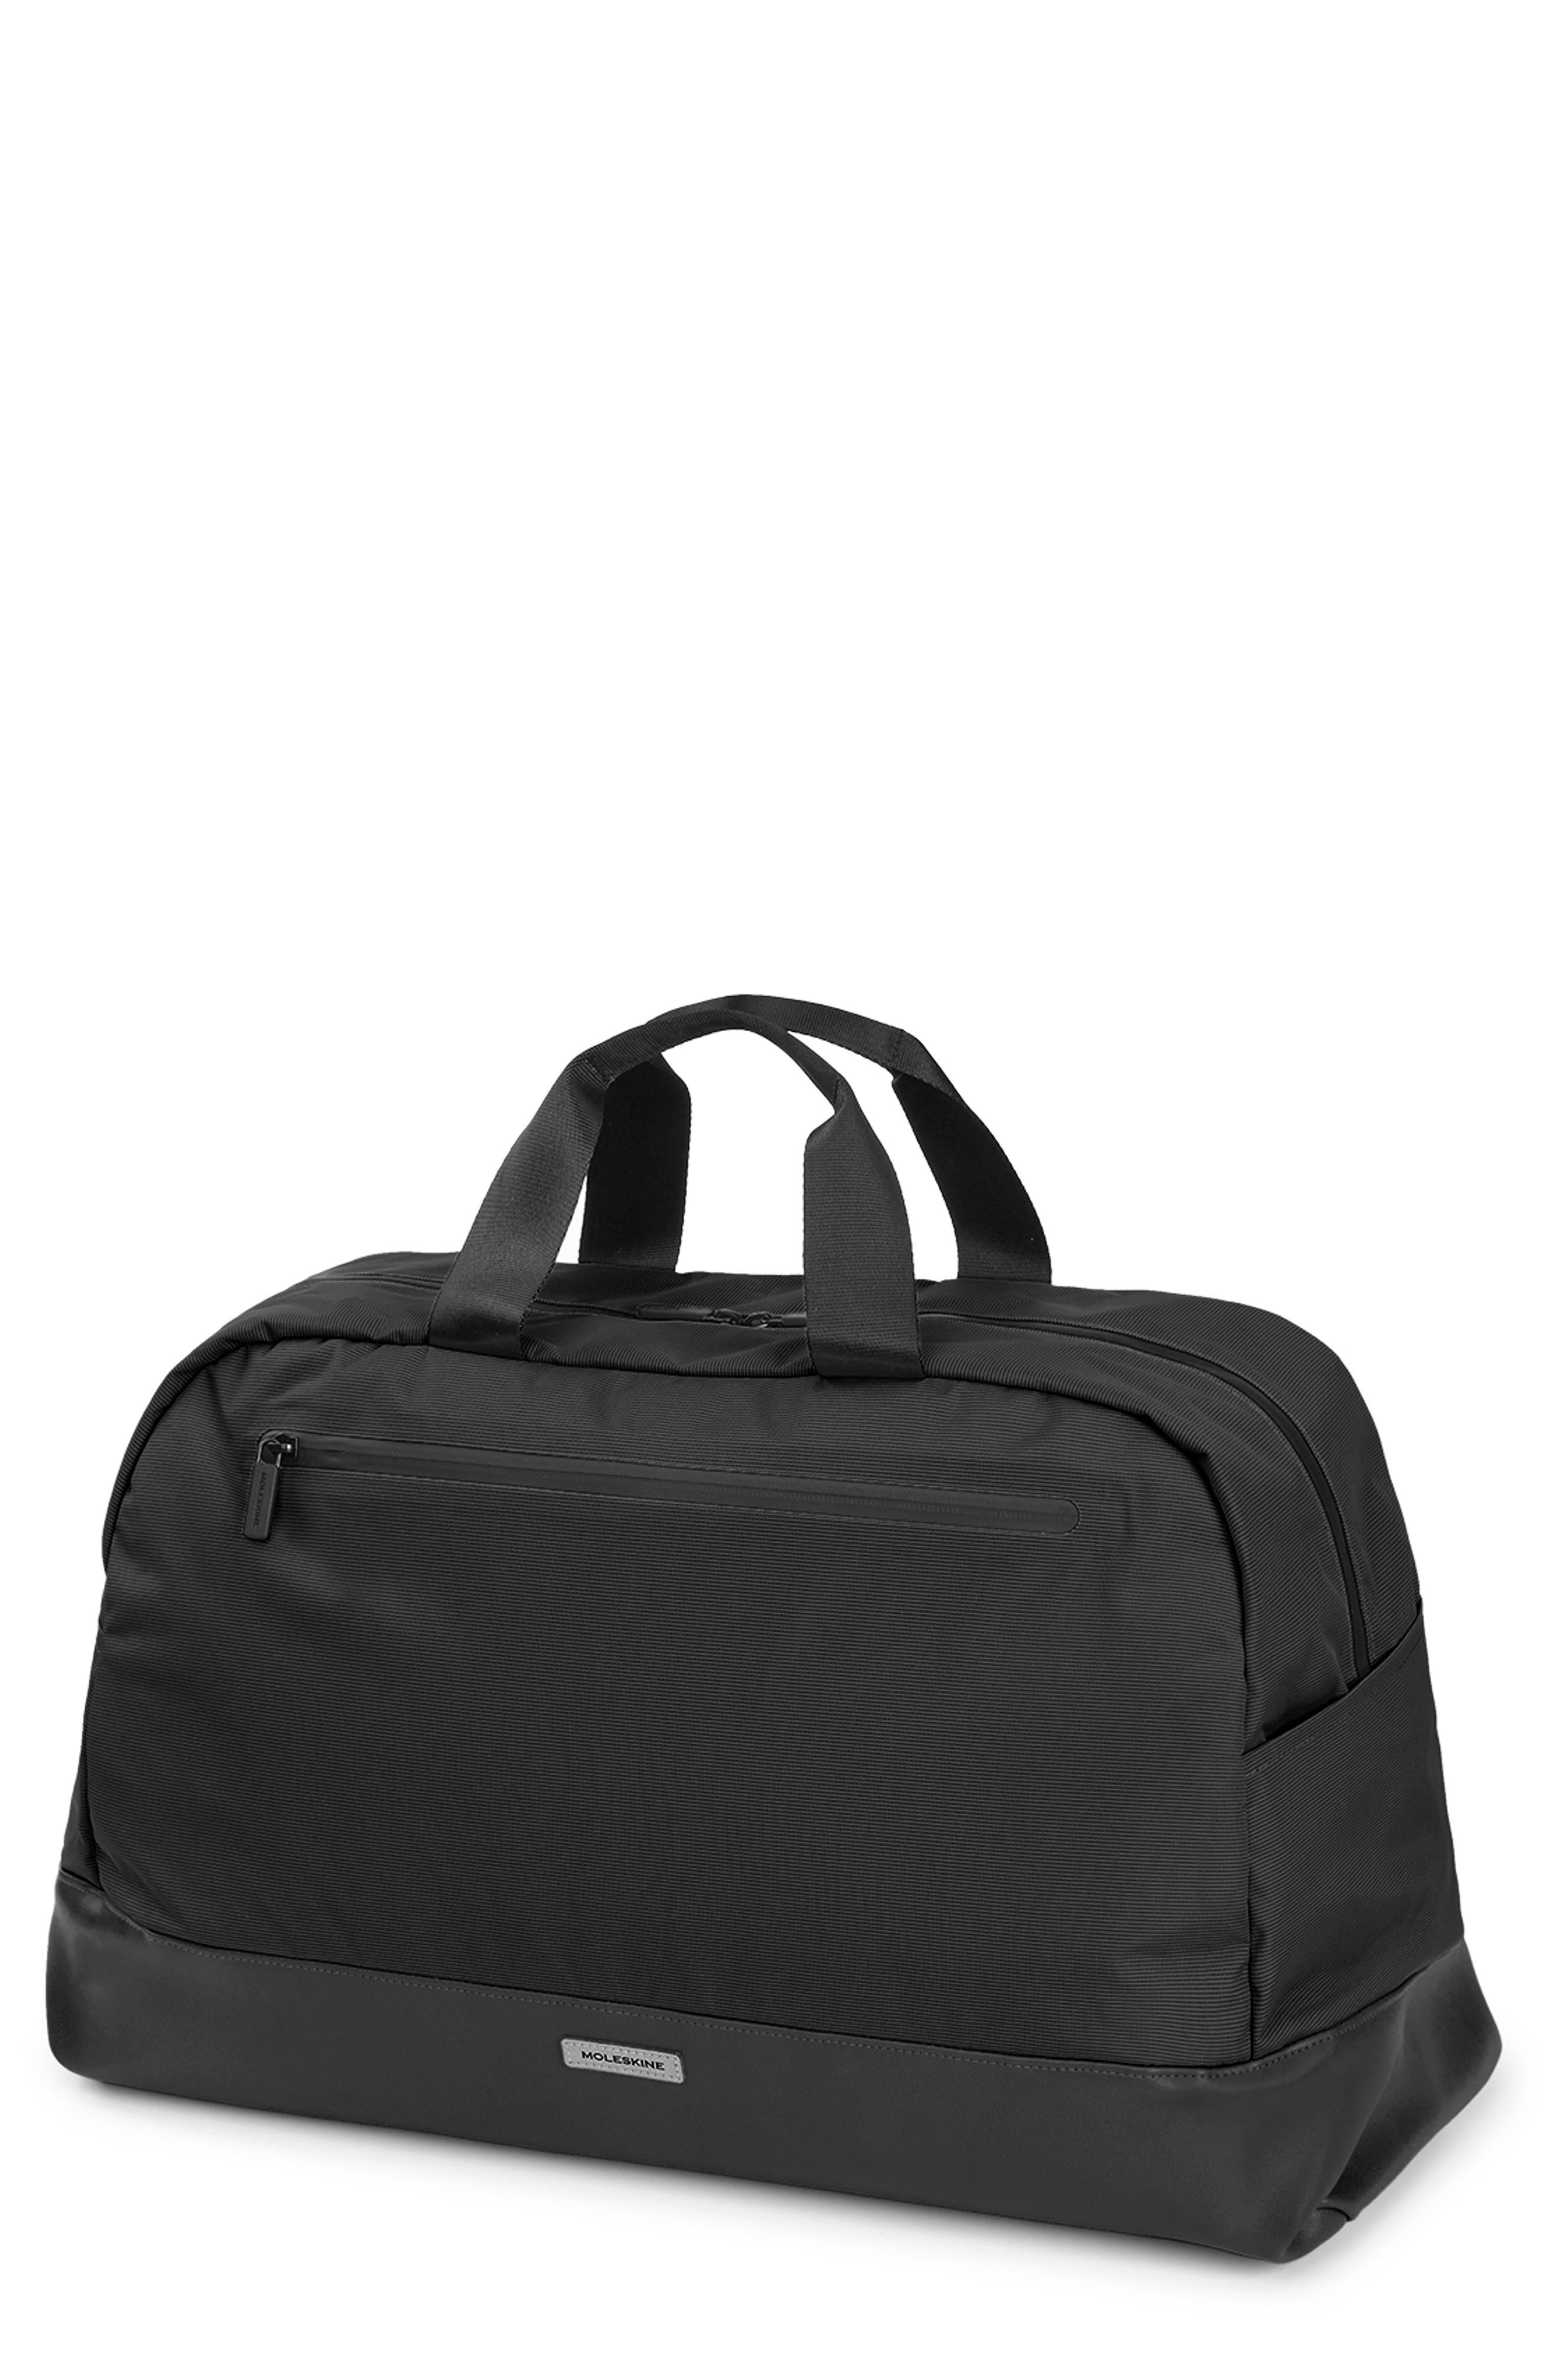 MOLESKINE Moleskin Metro Duffle Bag, Main, color, BLACK